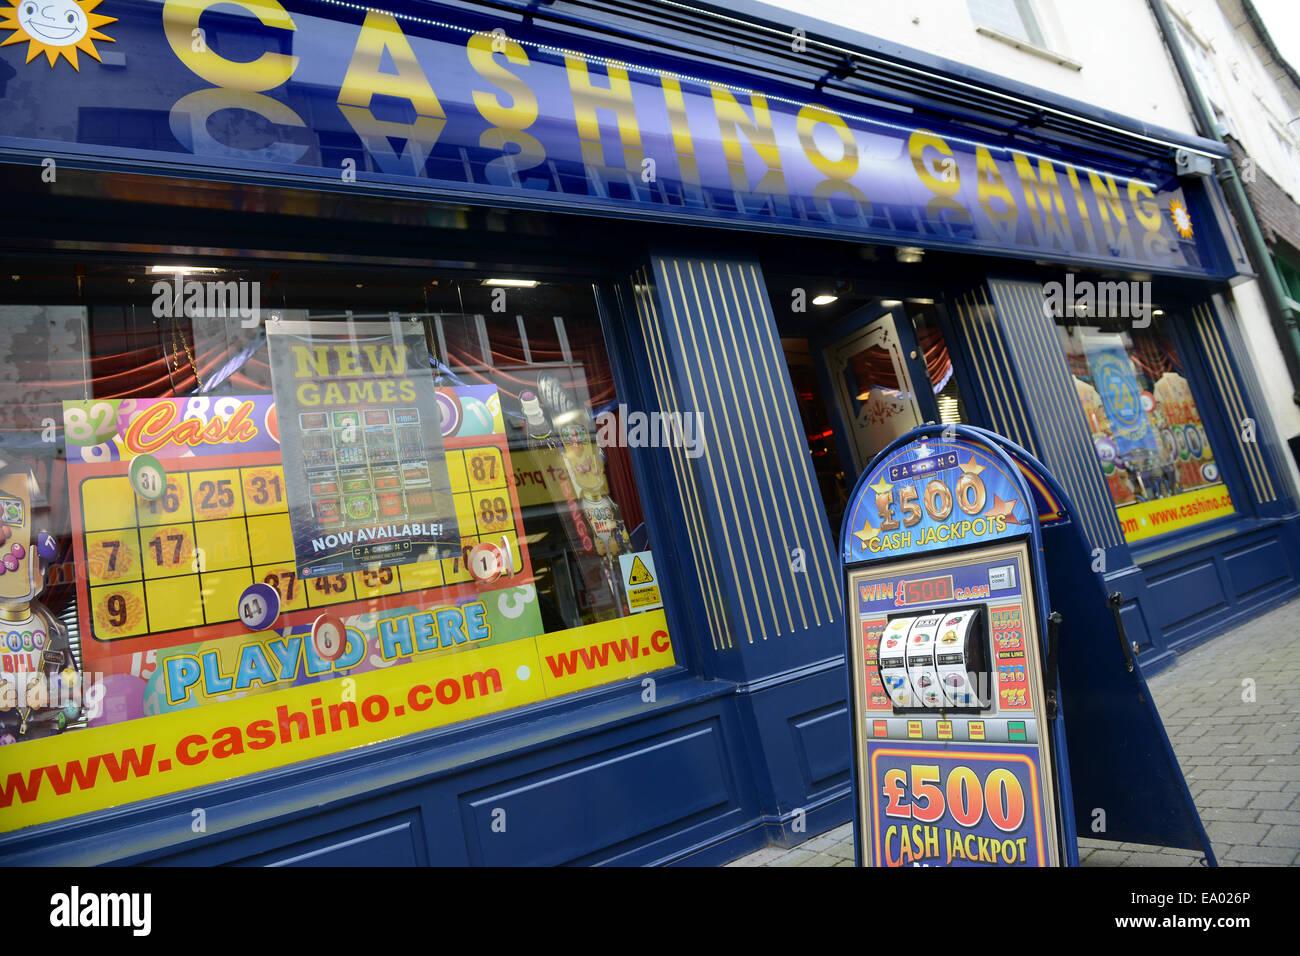 Cashino Gaming shop on New Street in Wellington Shropshire Uk casino gambling slot machine - Stock Image